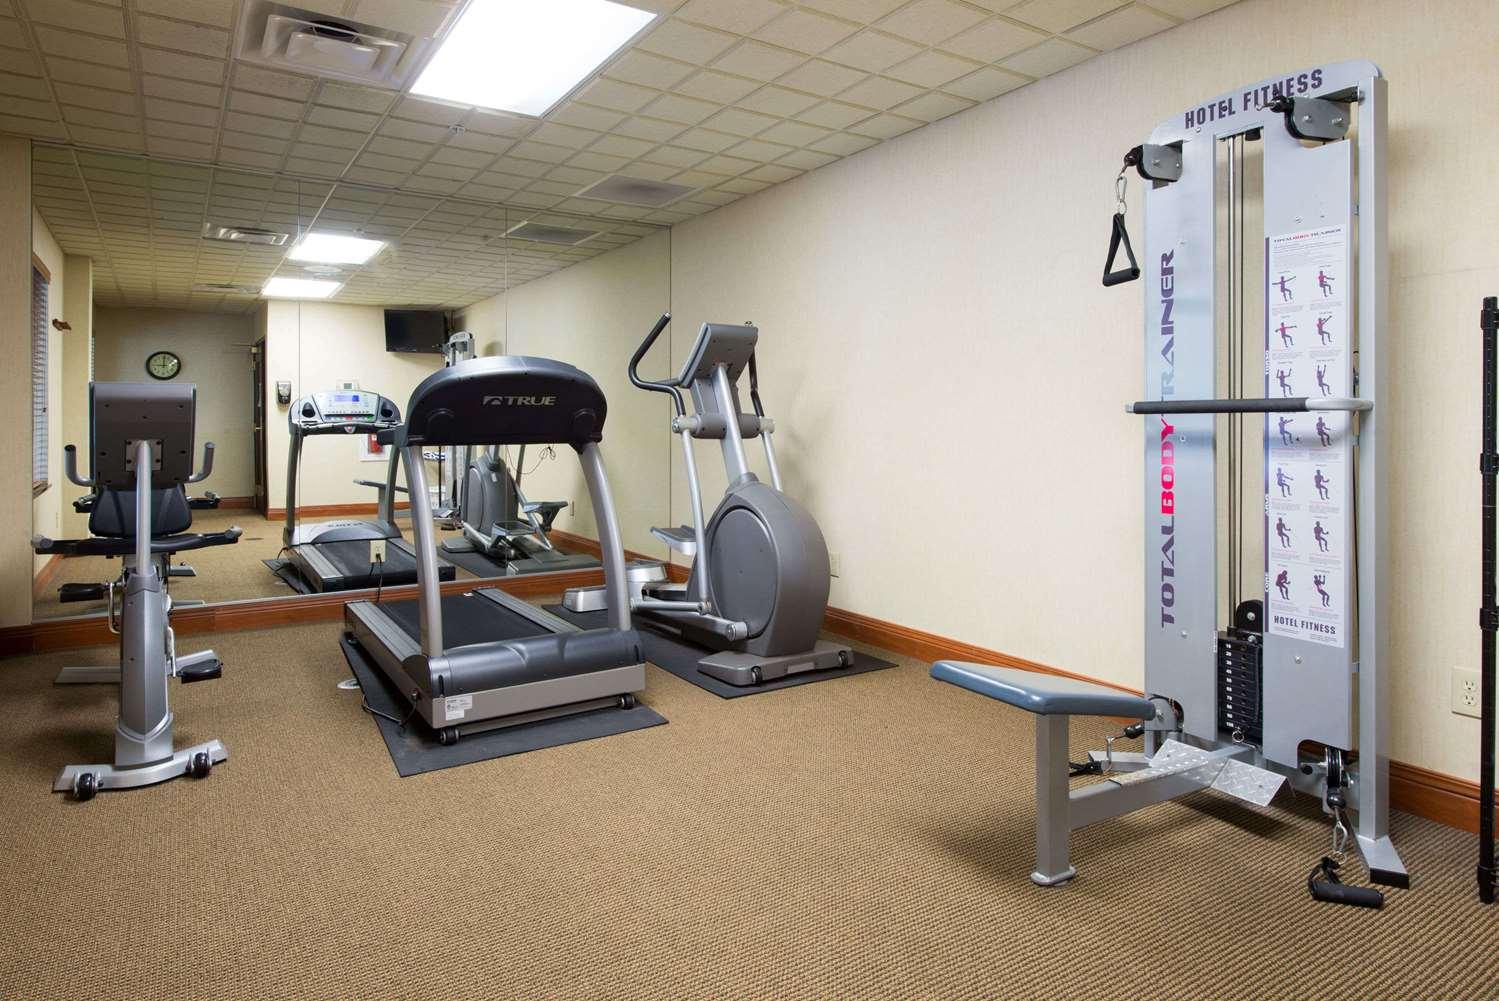 Fitness/ Exercise Room - Wingate by Wyndham Hotel Cincinnati Airport Erlanger